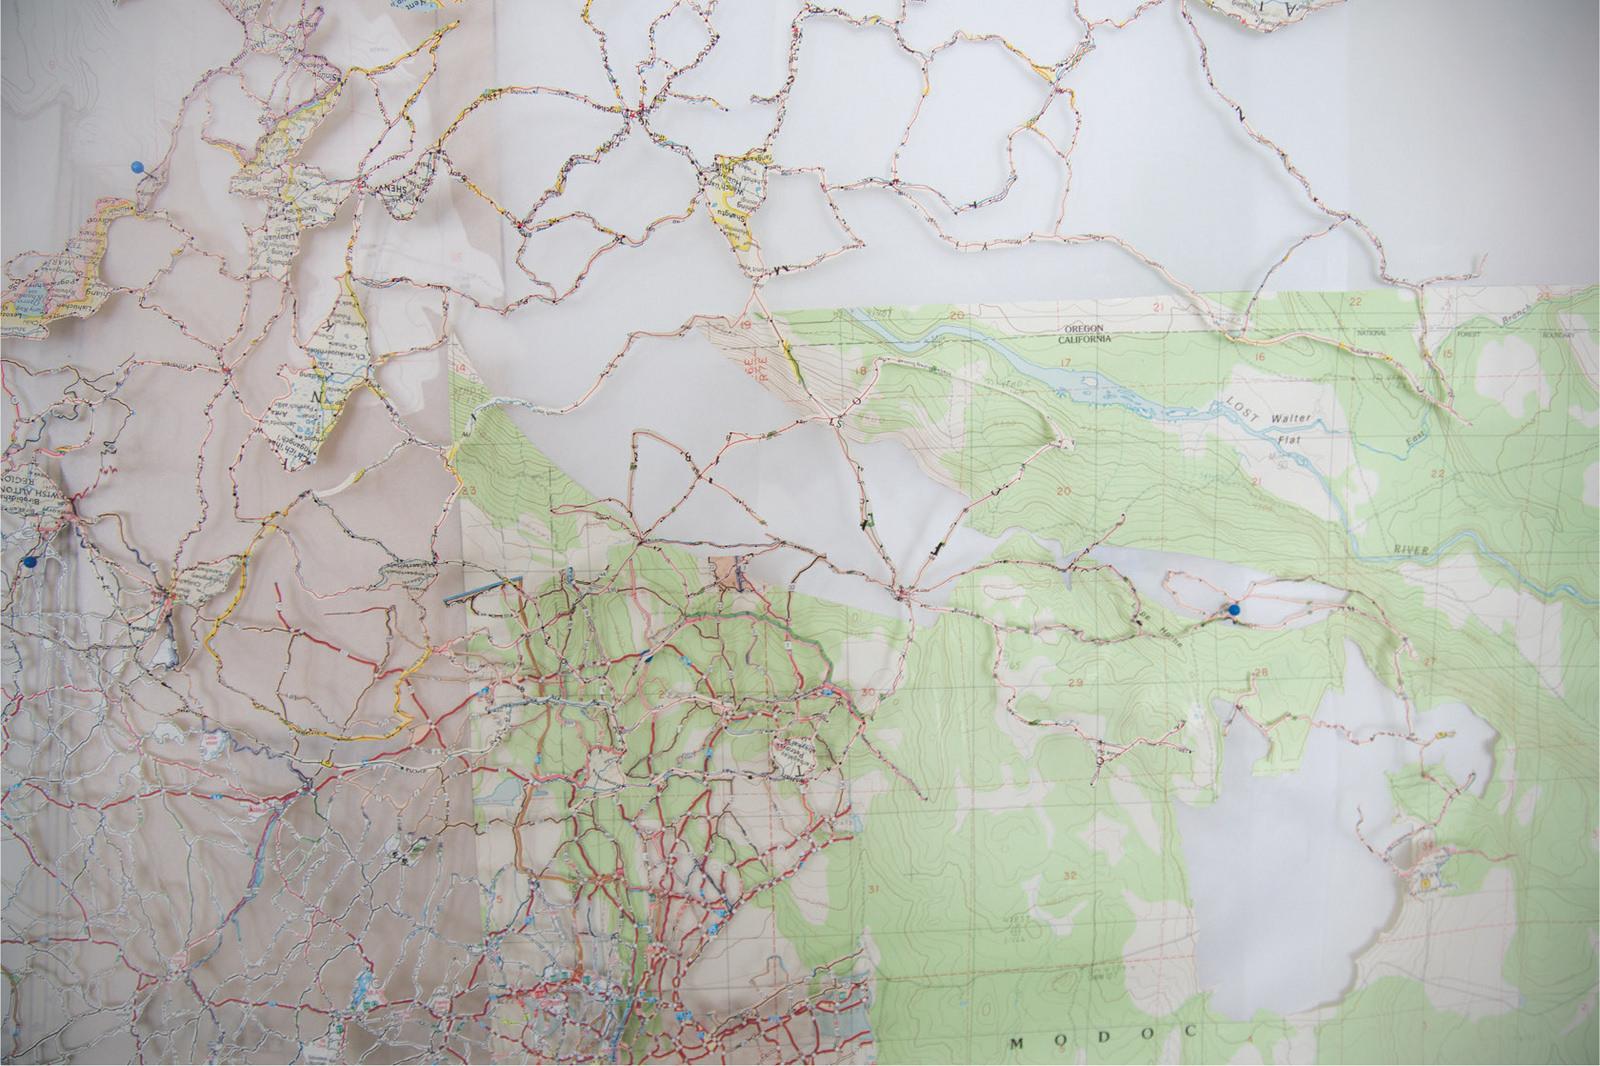 Michelle Daly, Re-imagined Landscape, detail